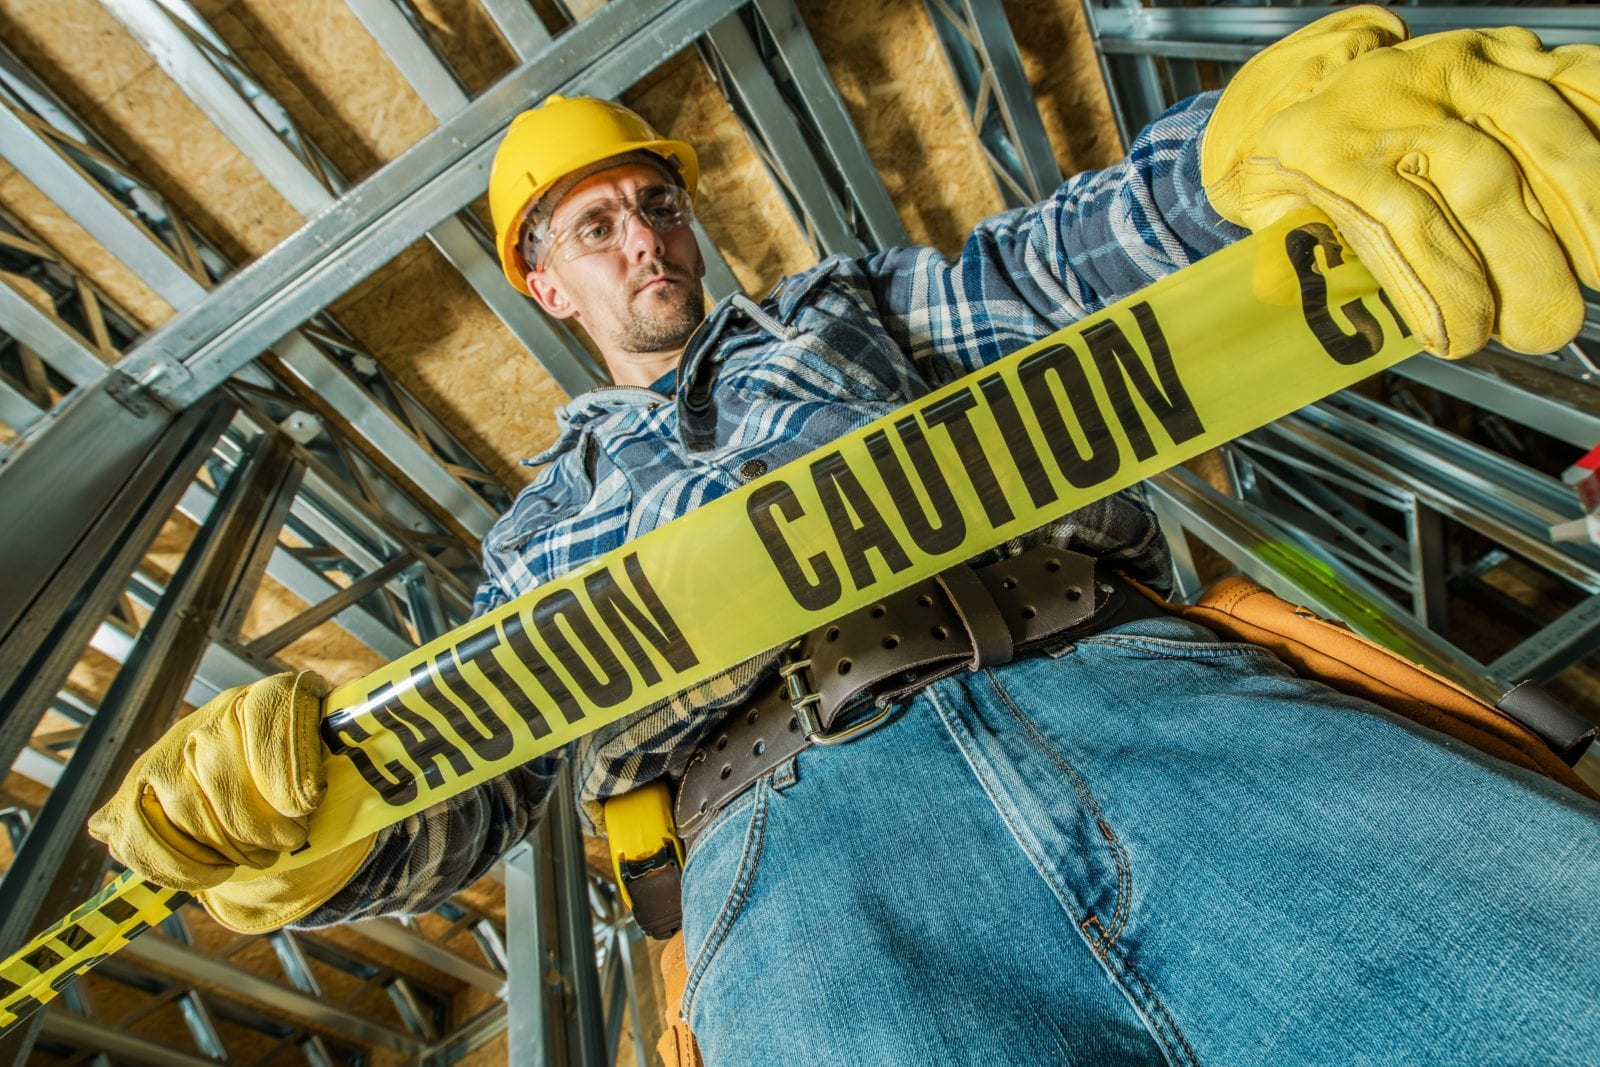 electrical hazard safety